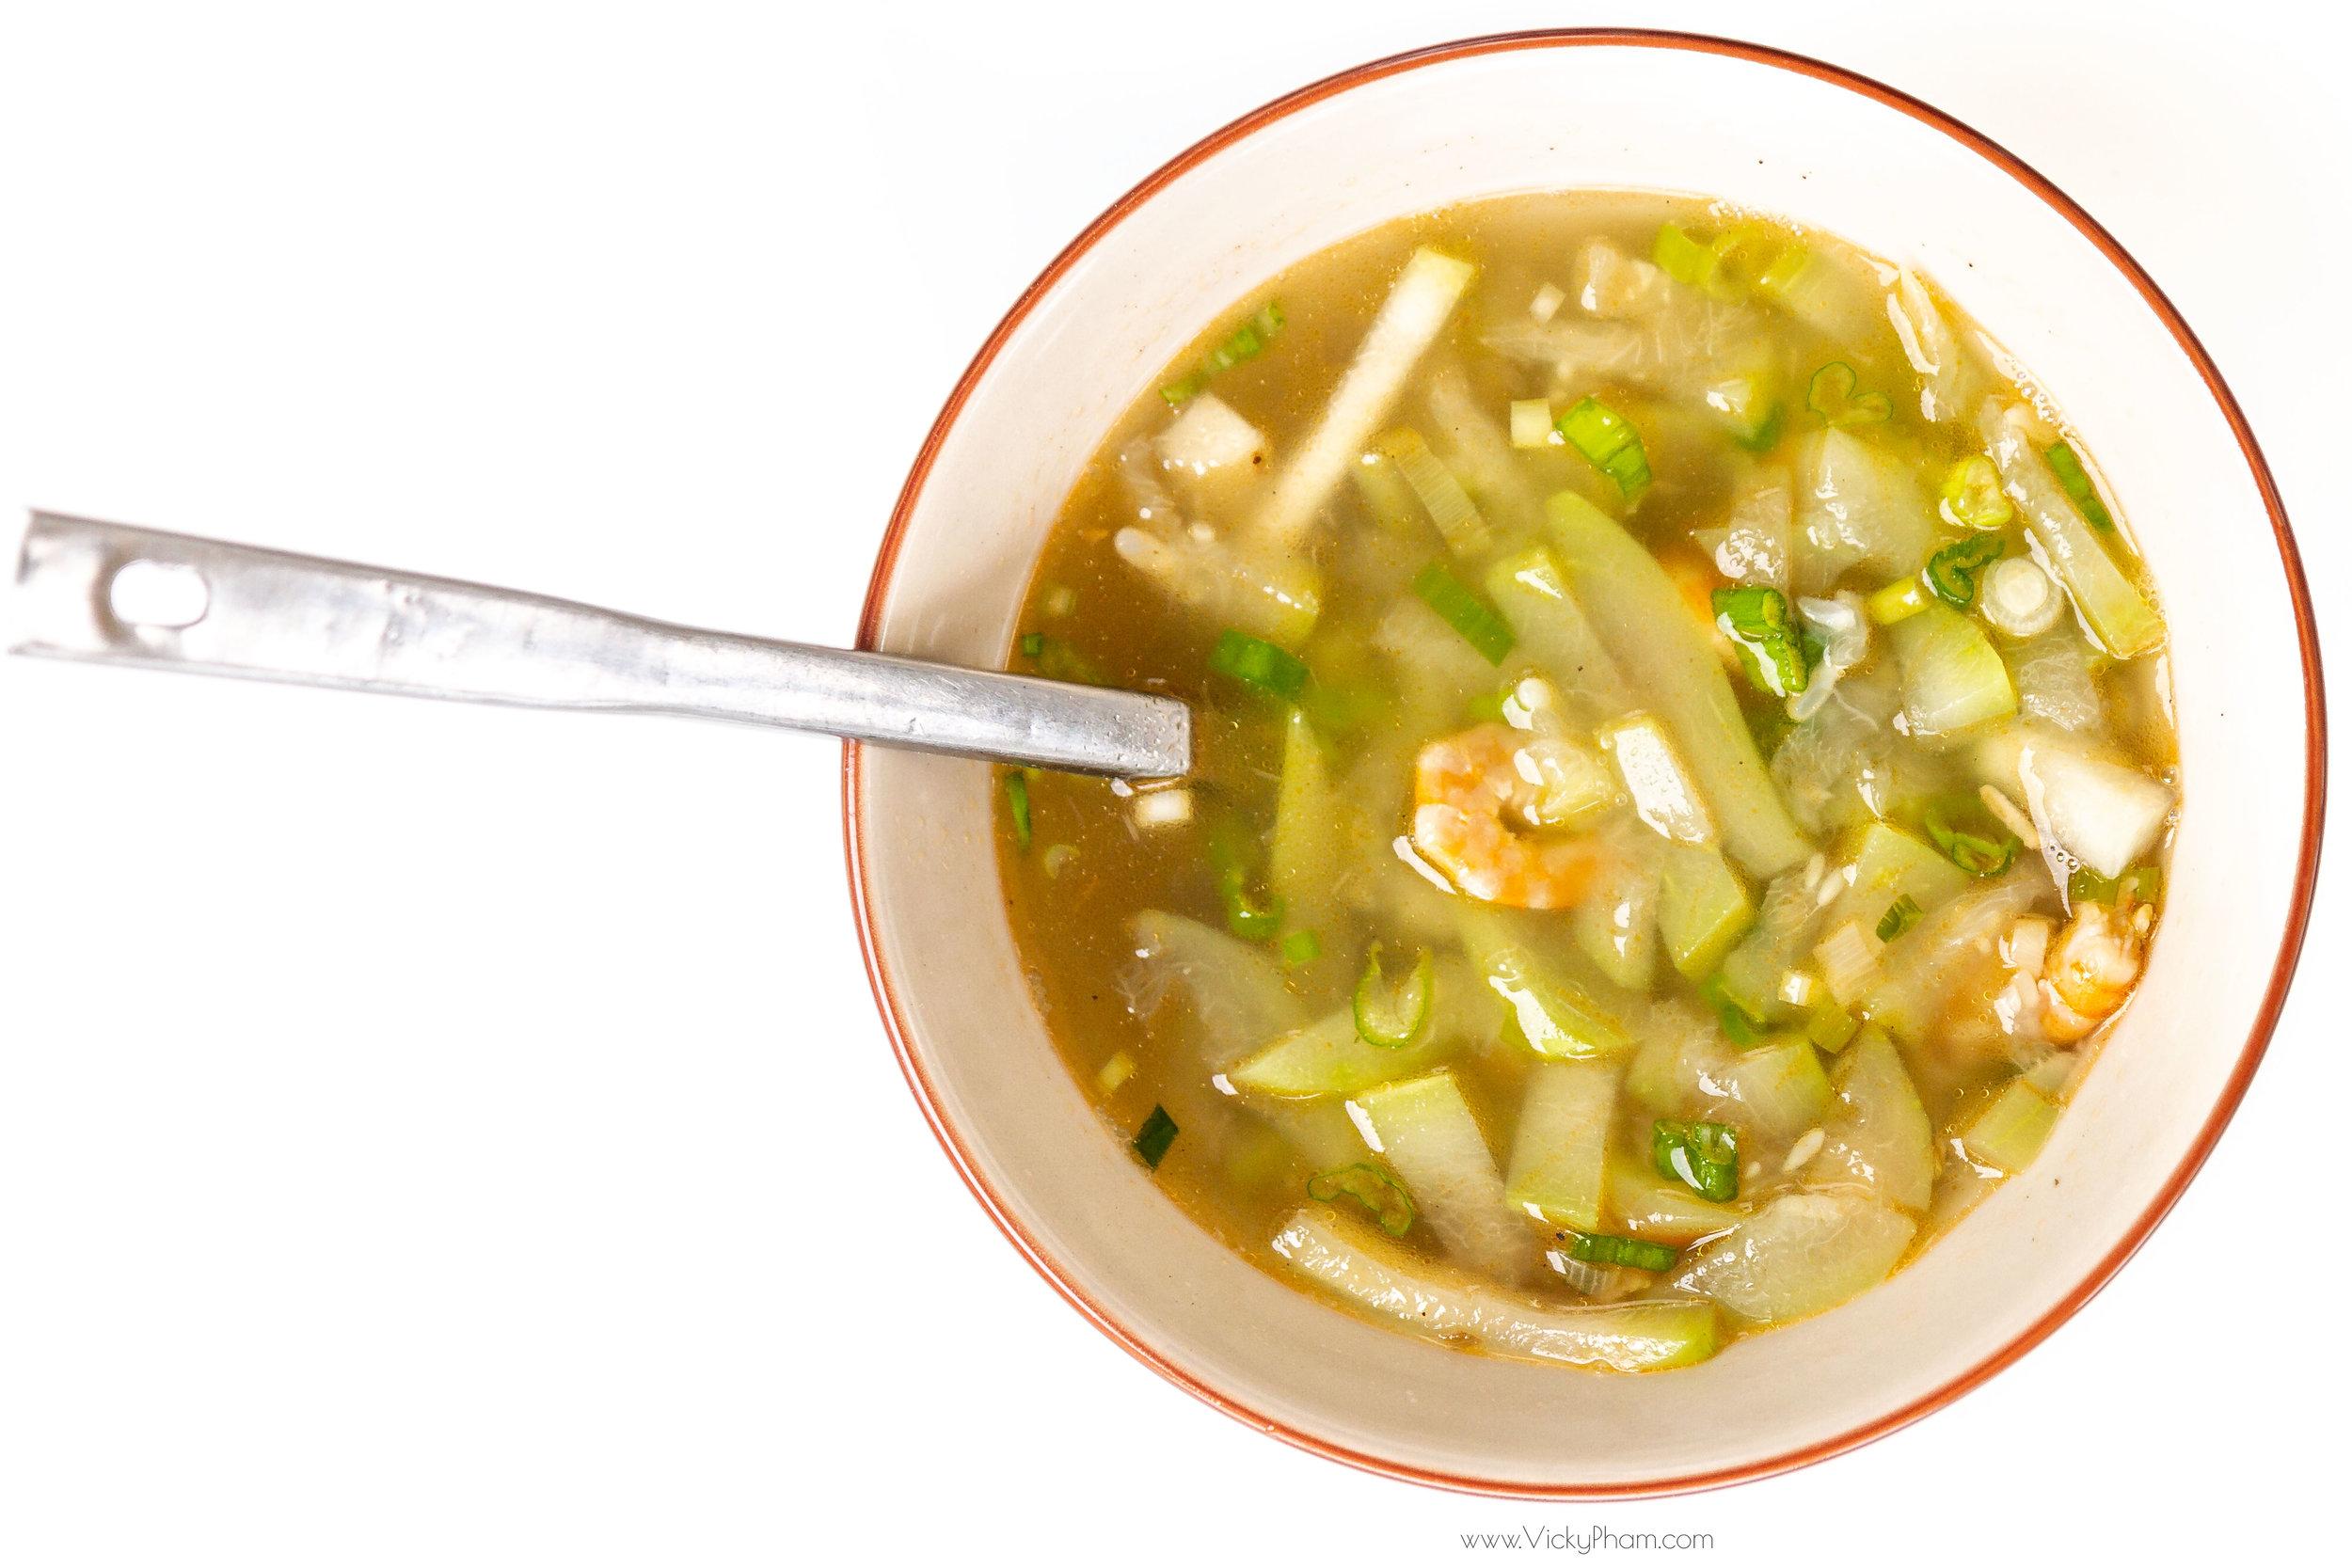 Canh Bầu Tôm (Vietnamese Opo Squash & Shrimp Soup)